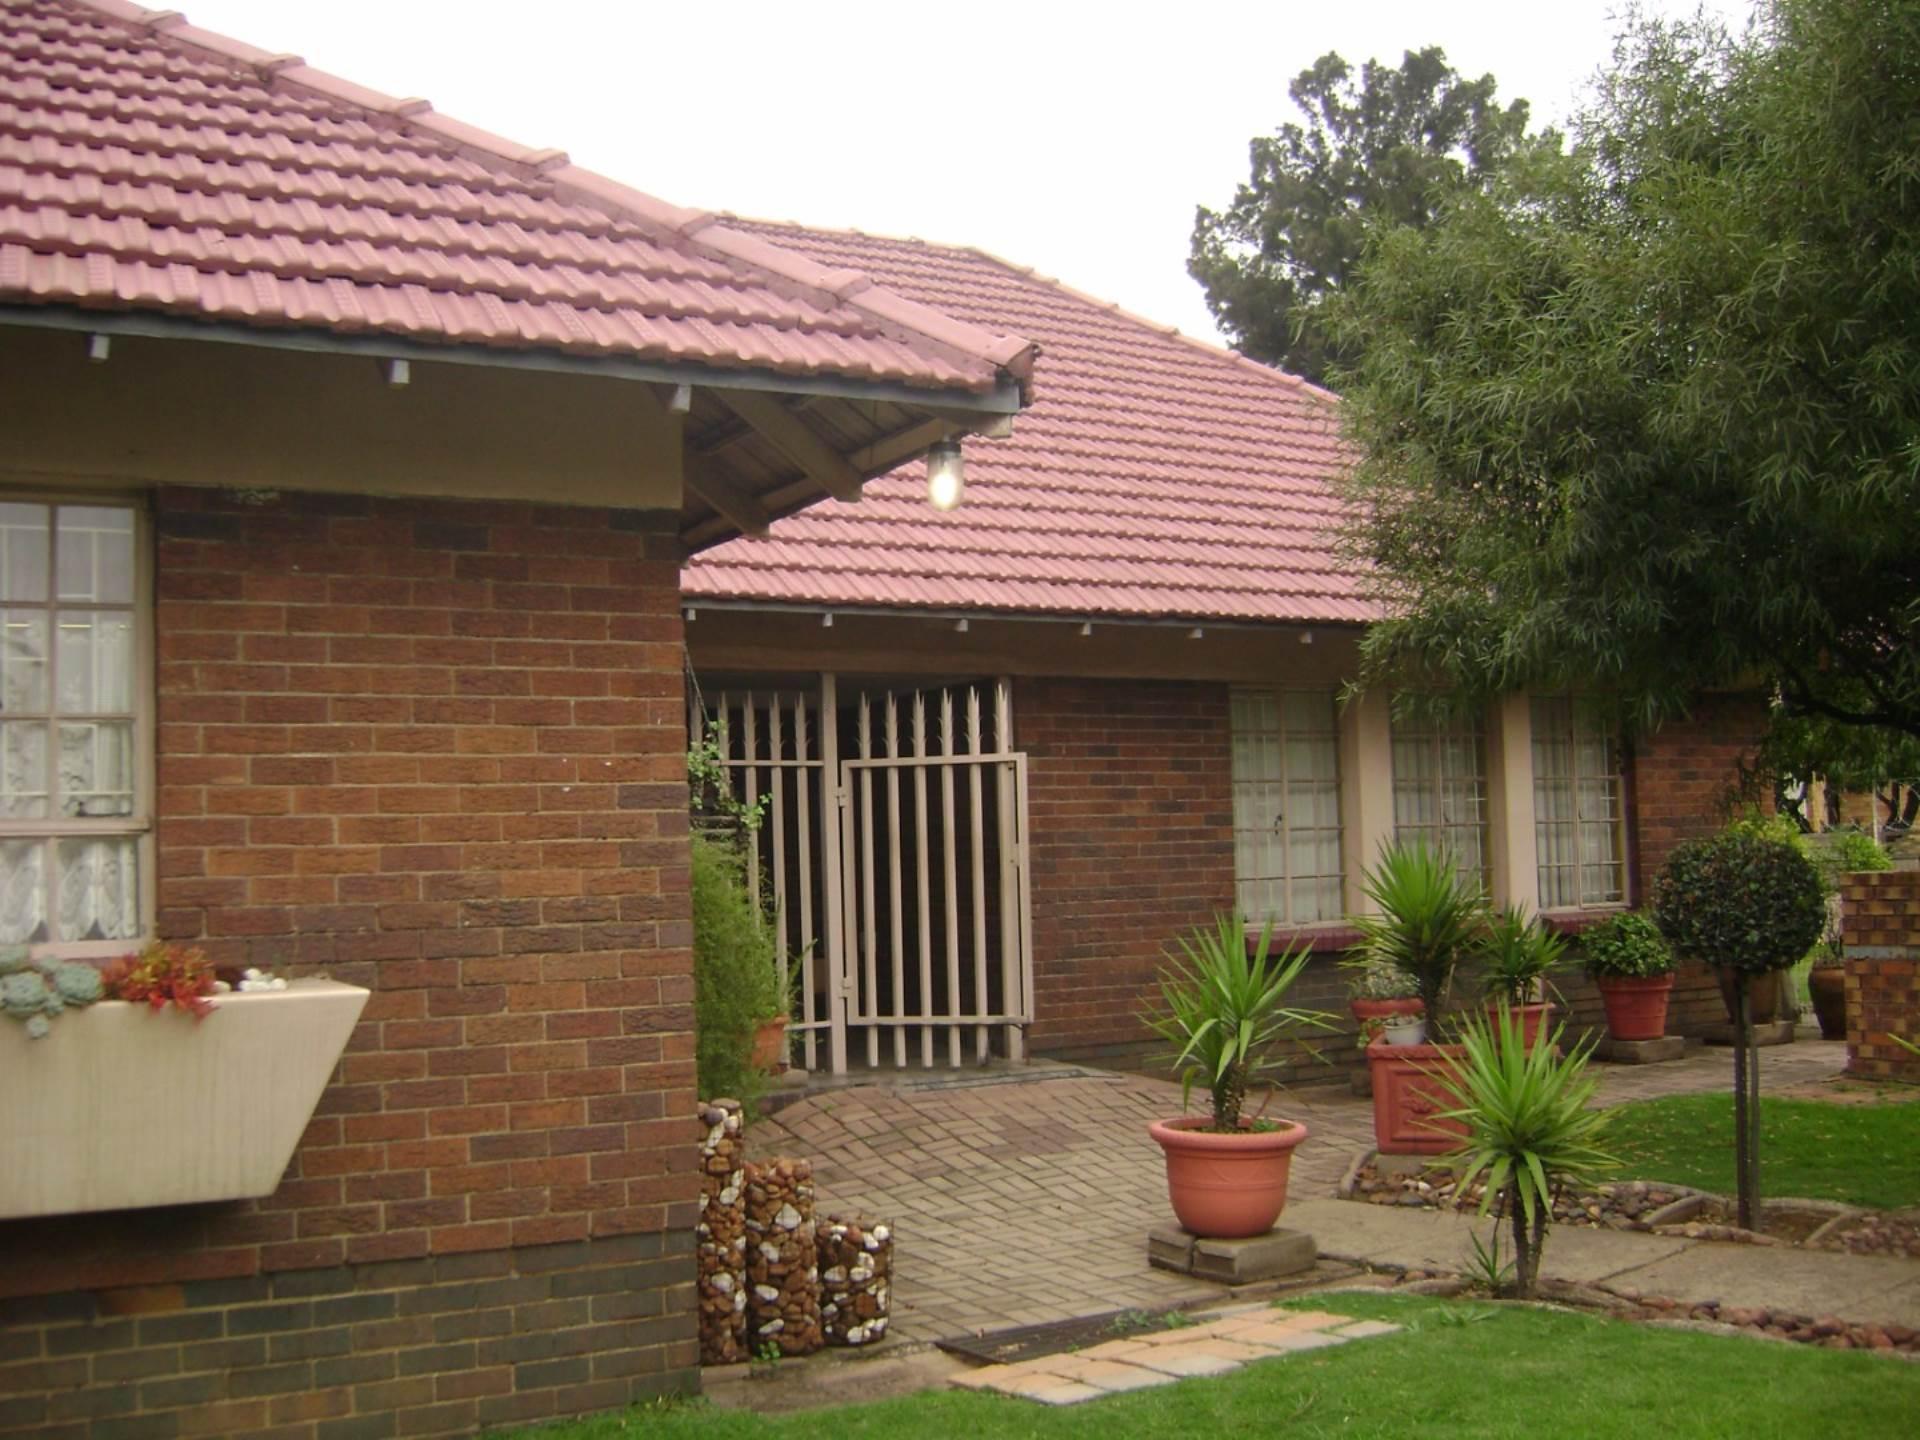 3 BedroomHouse For Sale In Komati